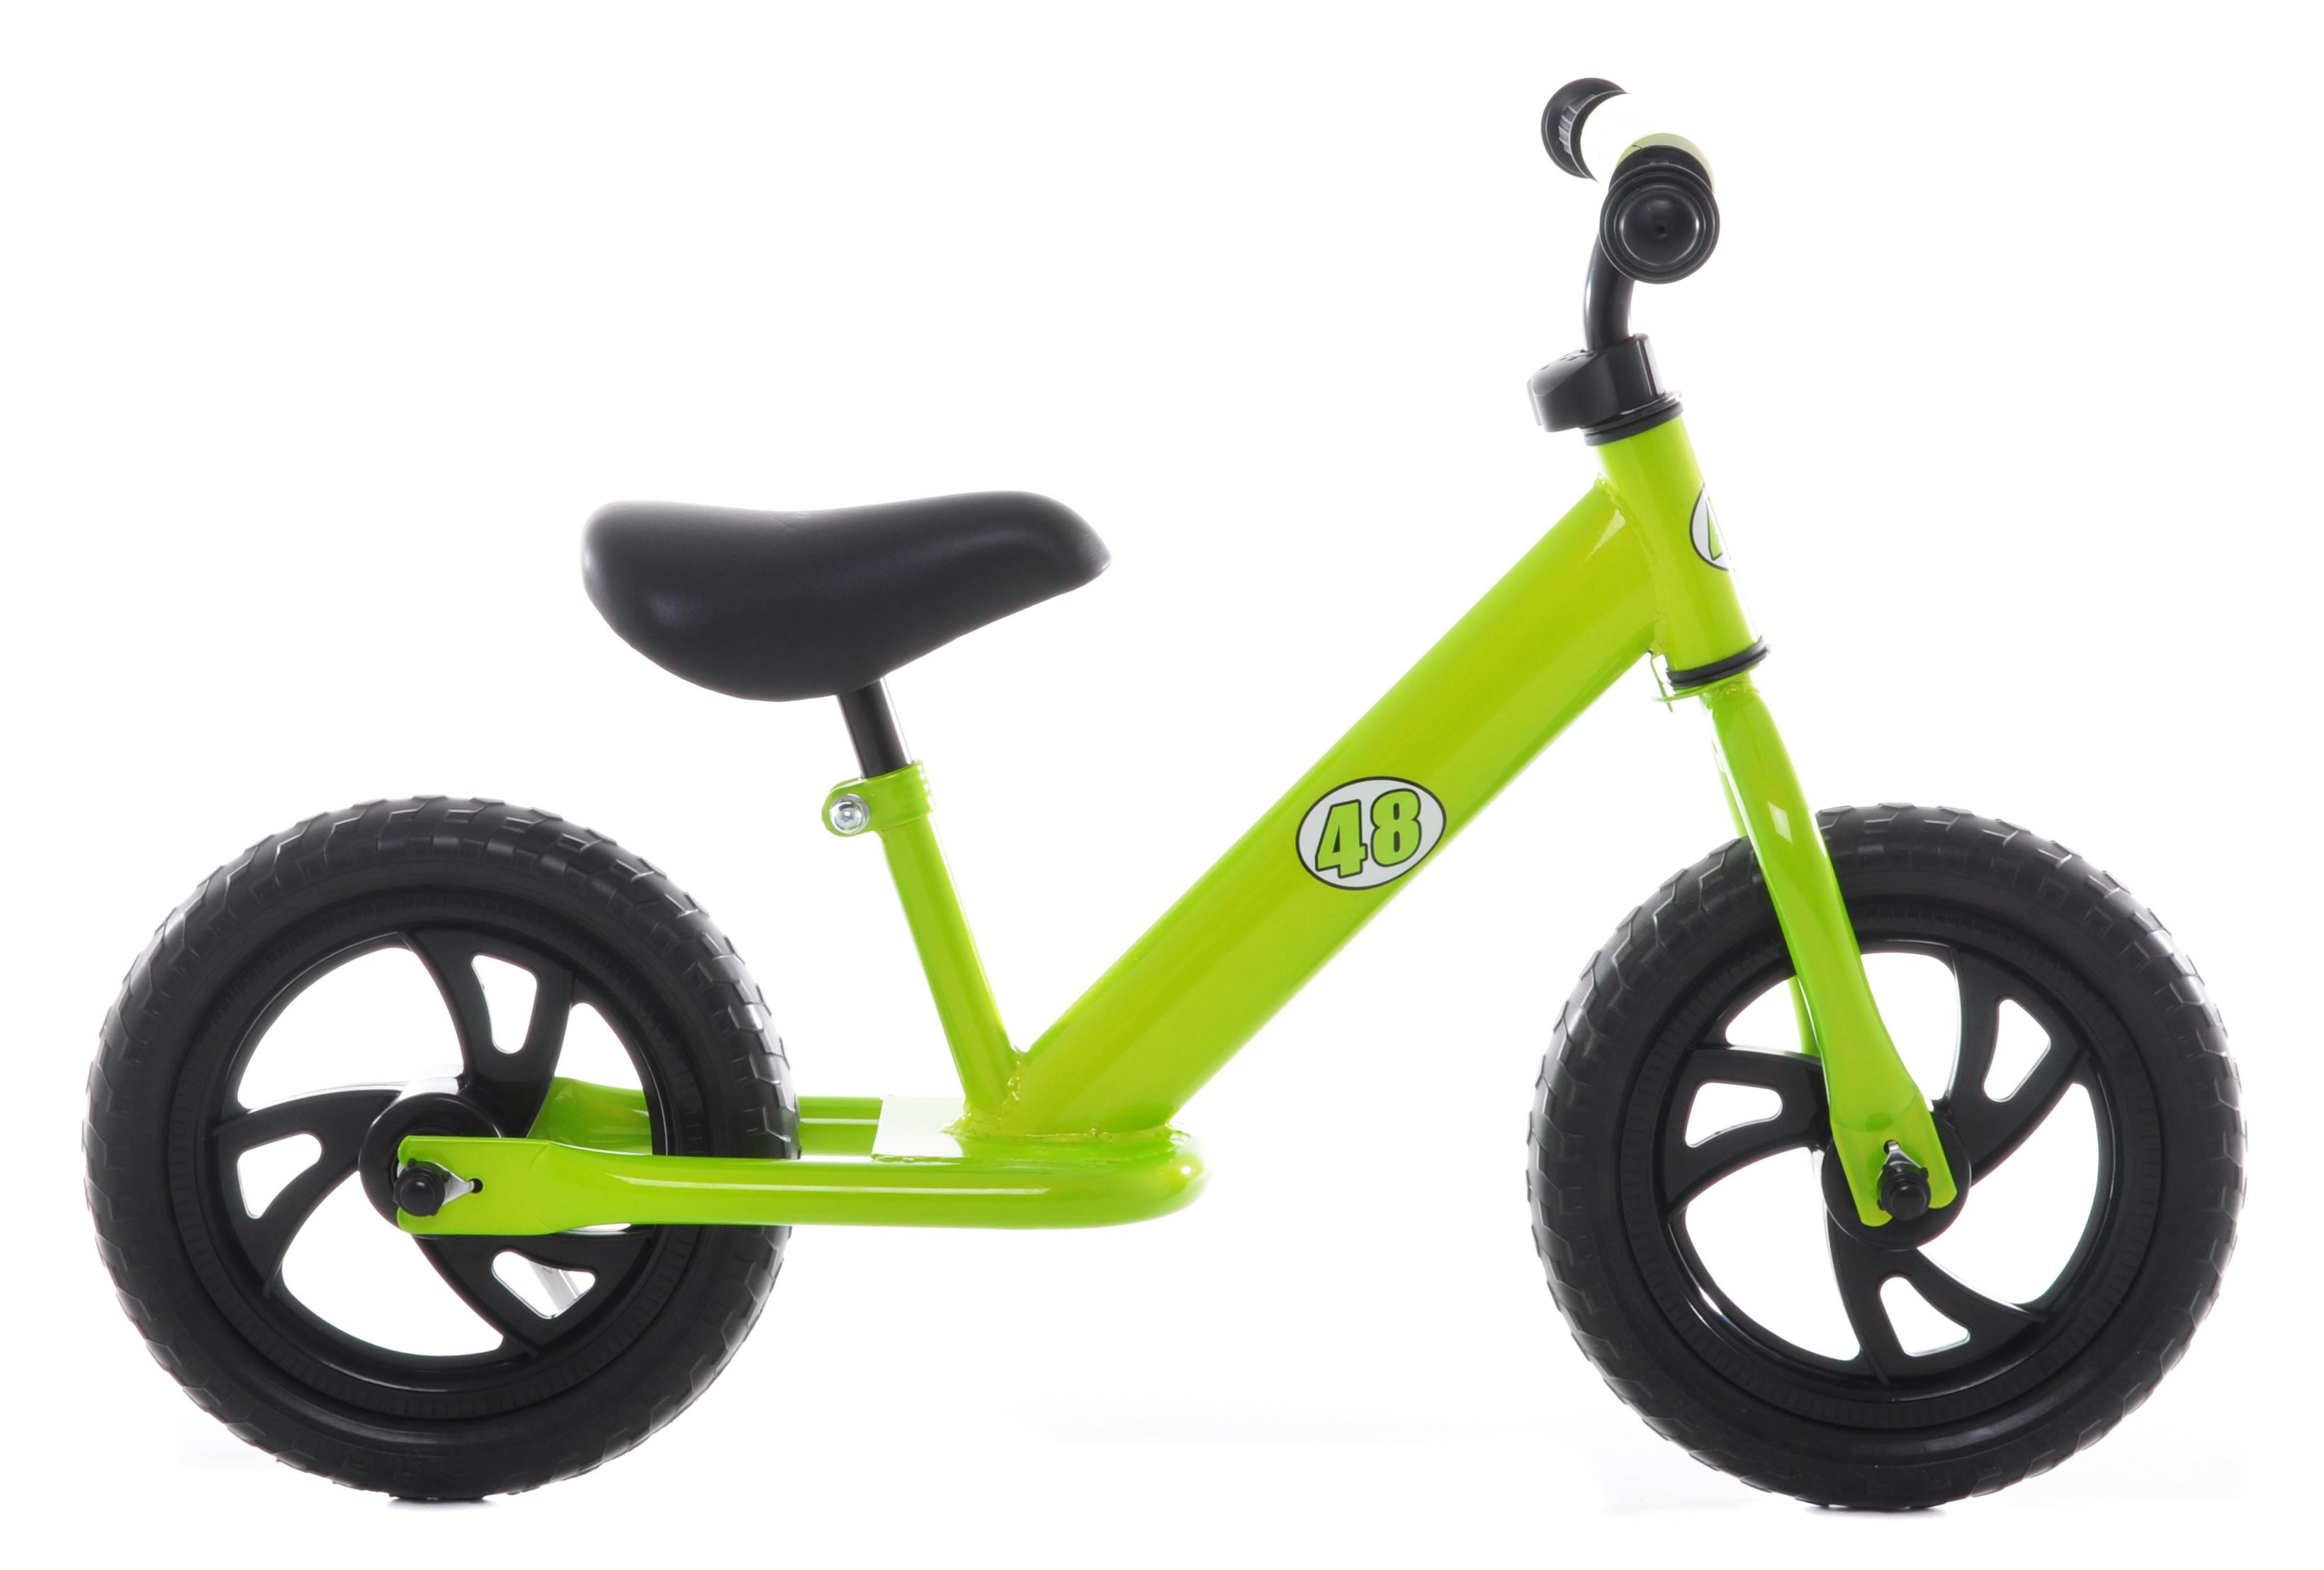 Vilano-Rally-Childrens-Balance-Bike-No-Pedal-Toddler-Push-Bicycle thumbnail 16